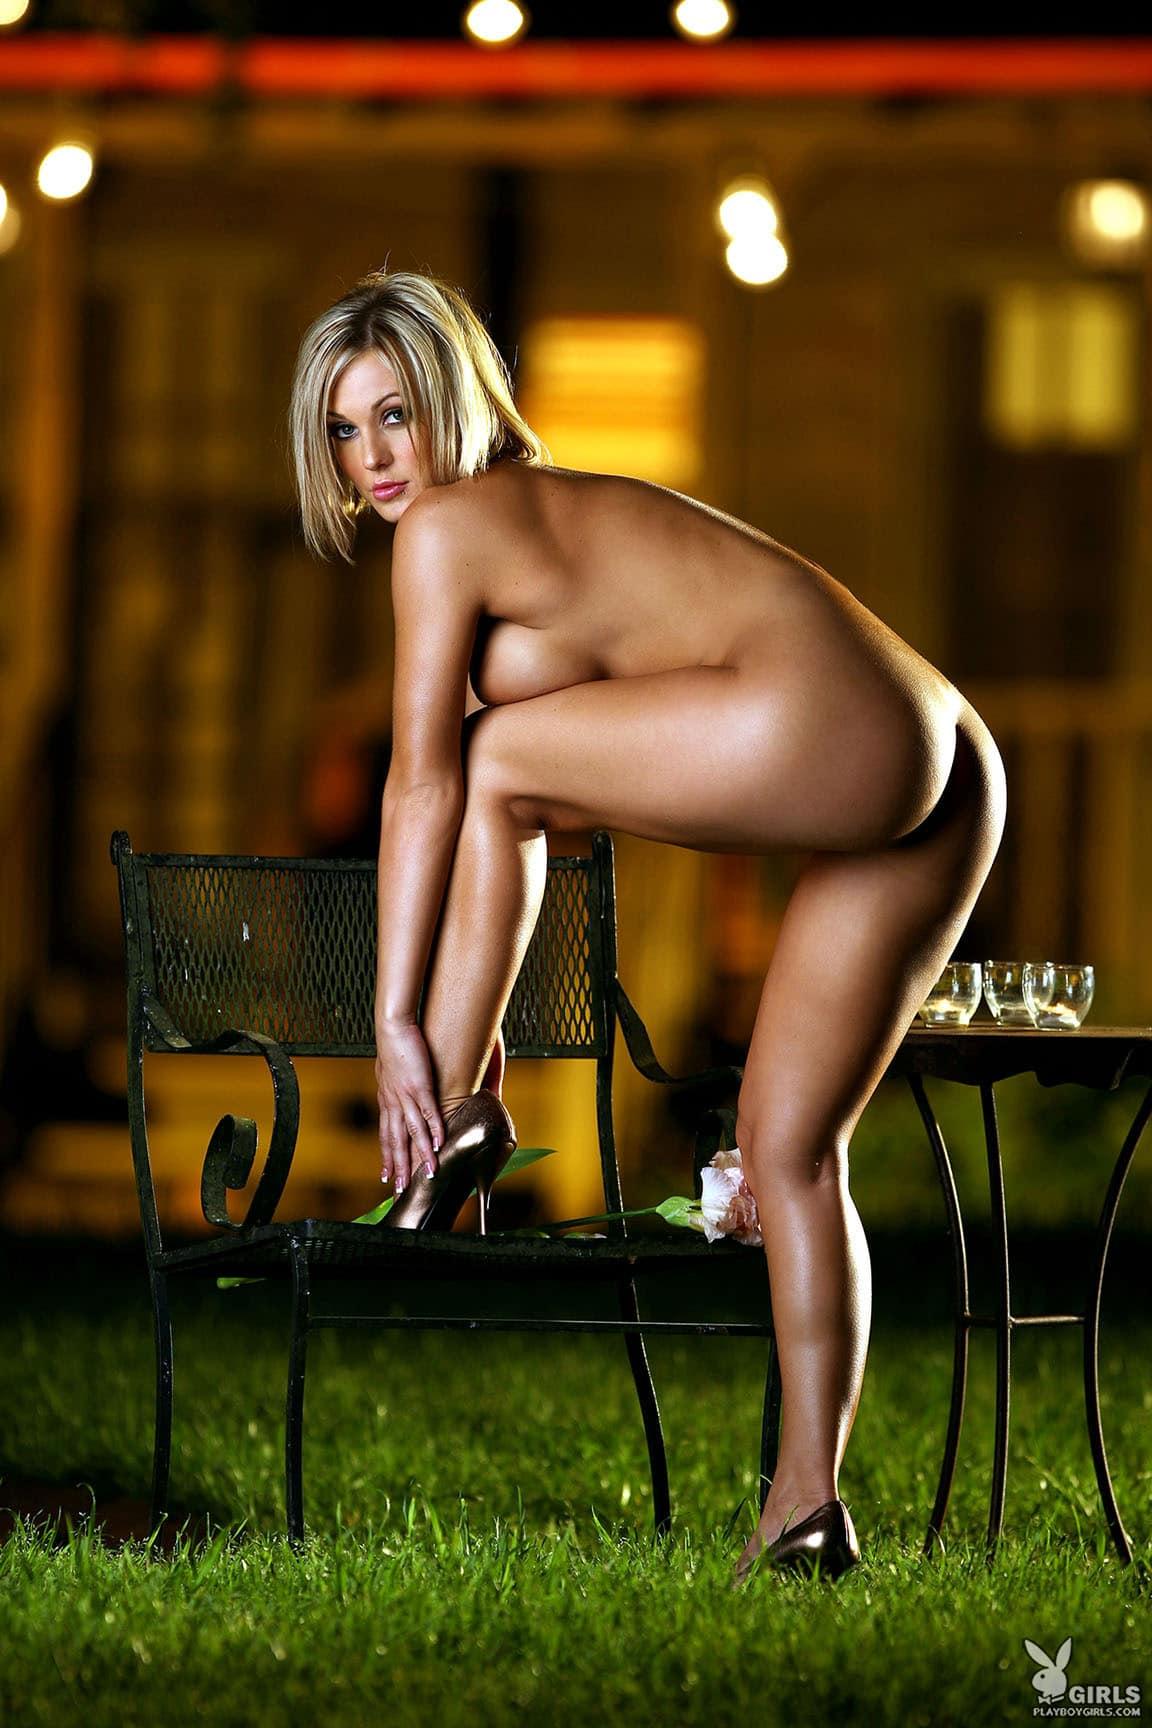 Crystal Stevens posing naked on grass in evening